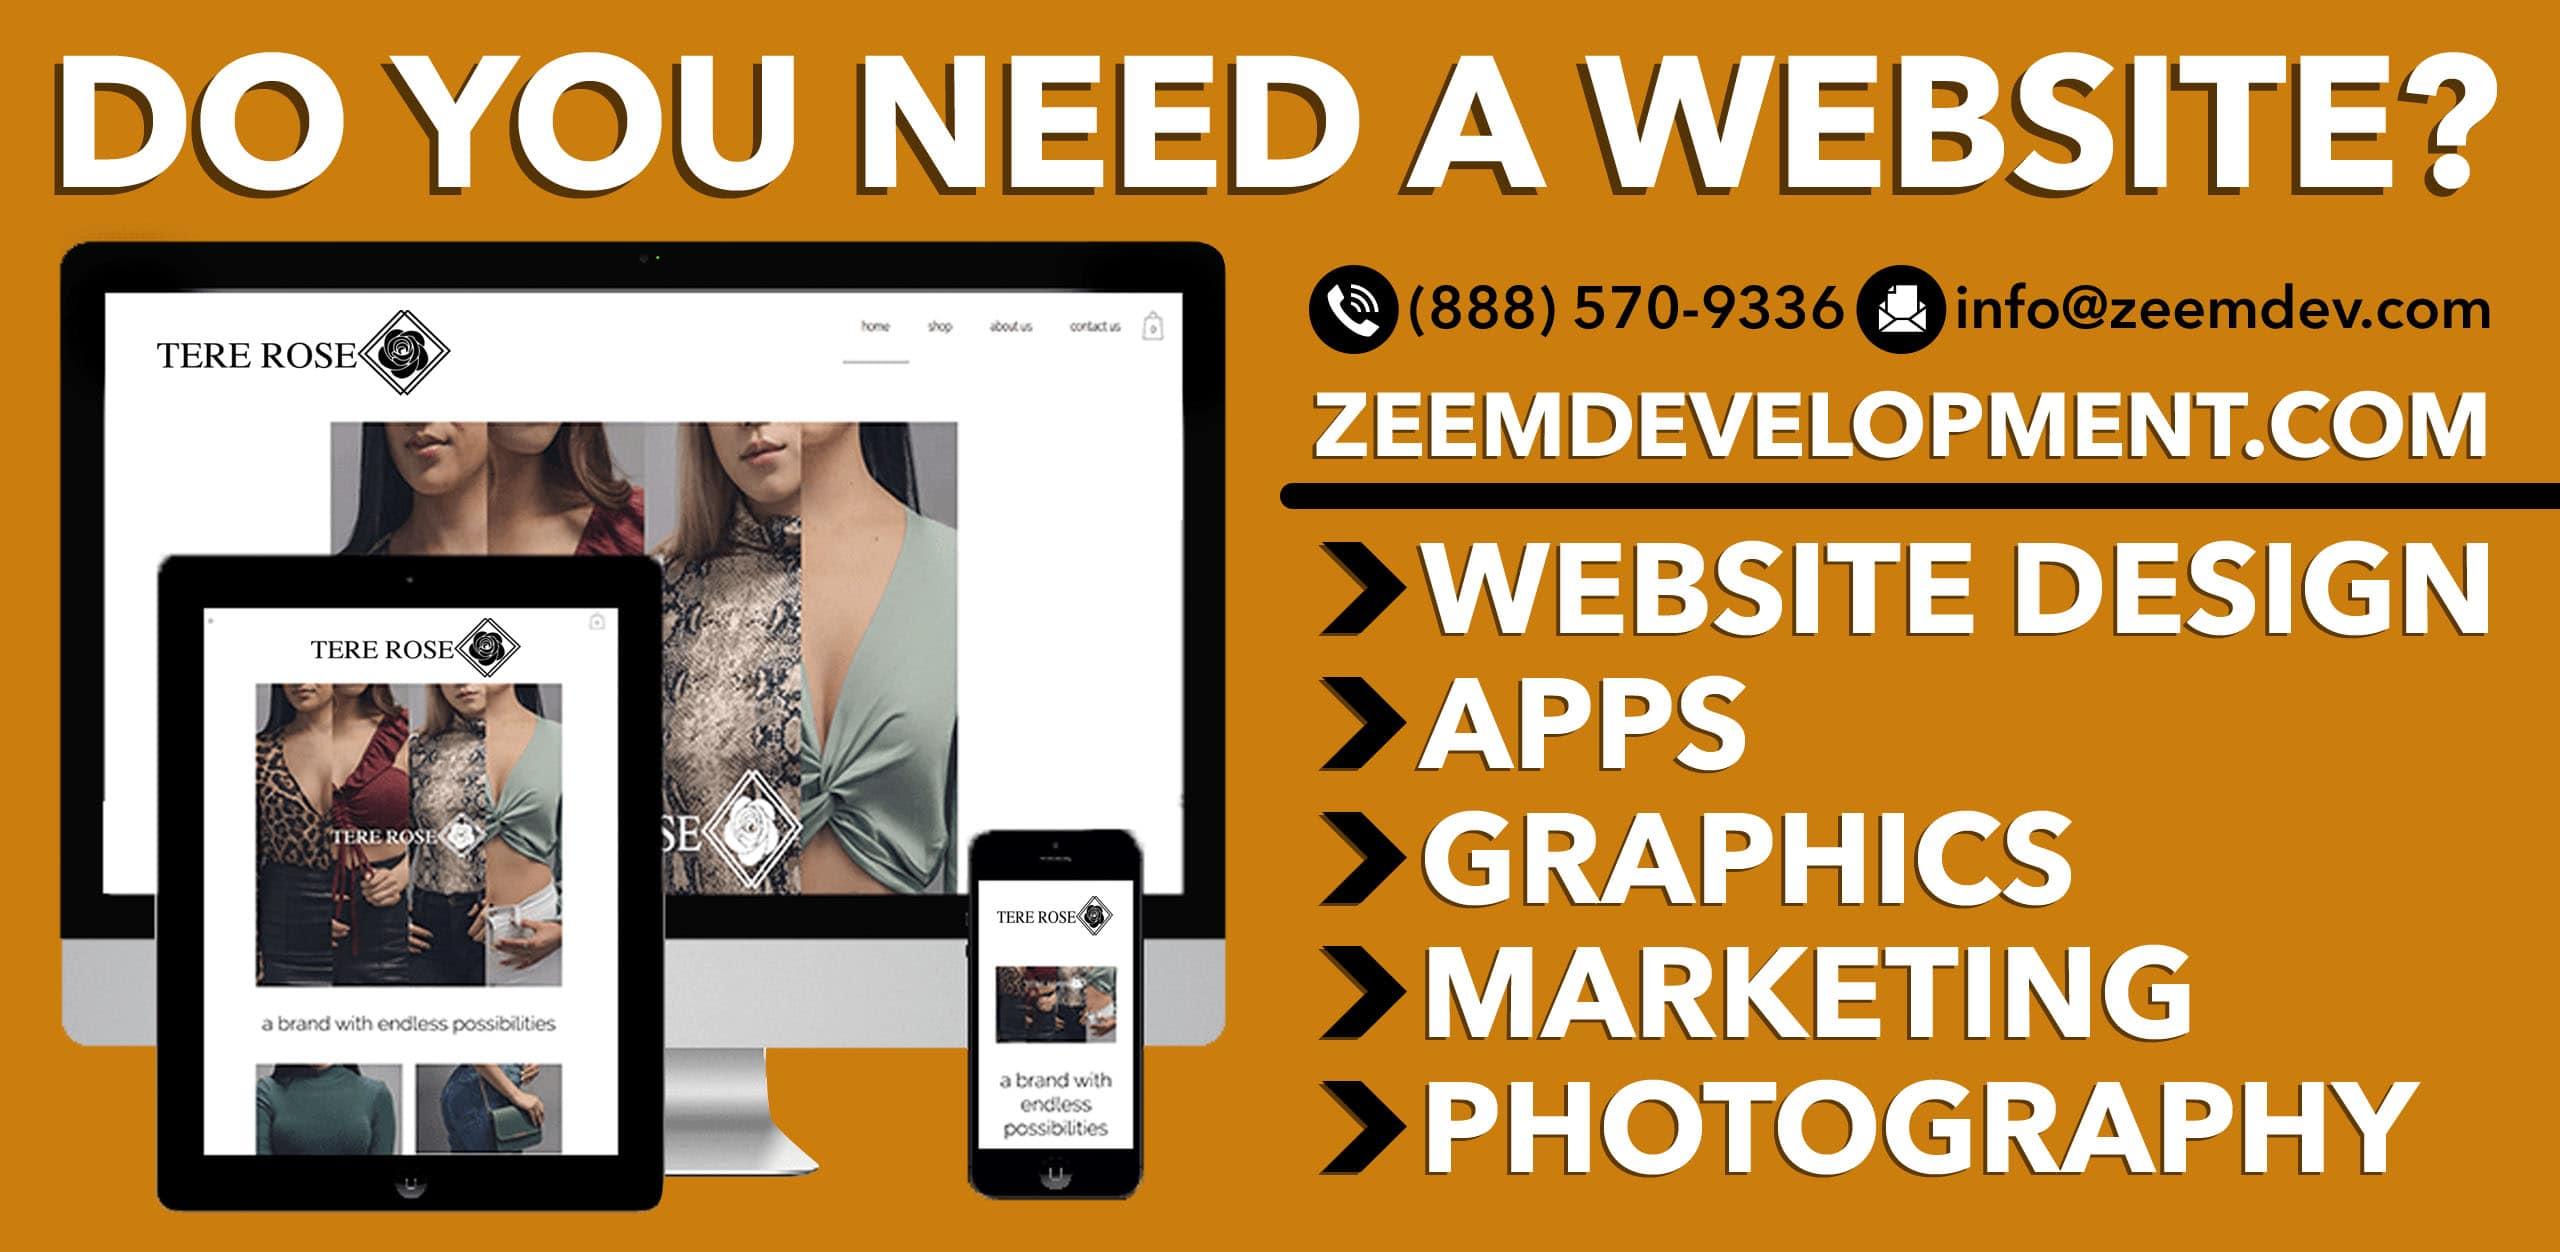 Zeem Development